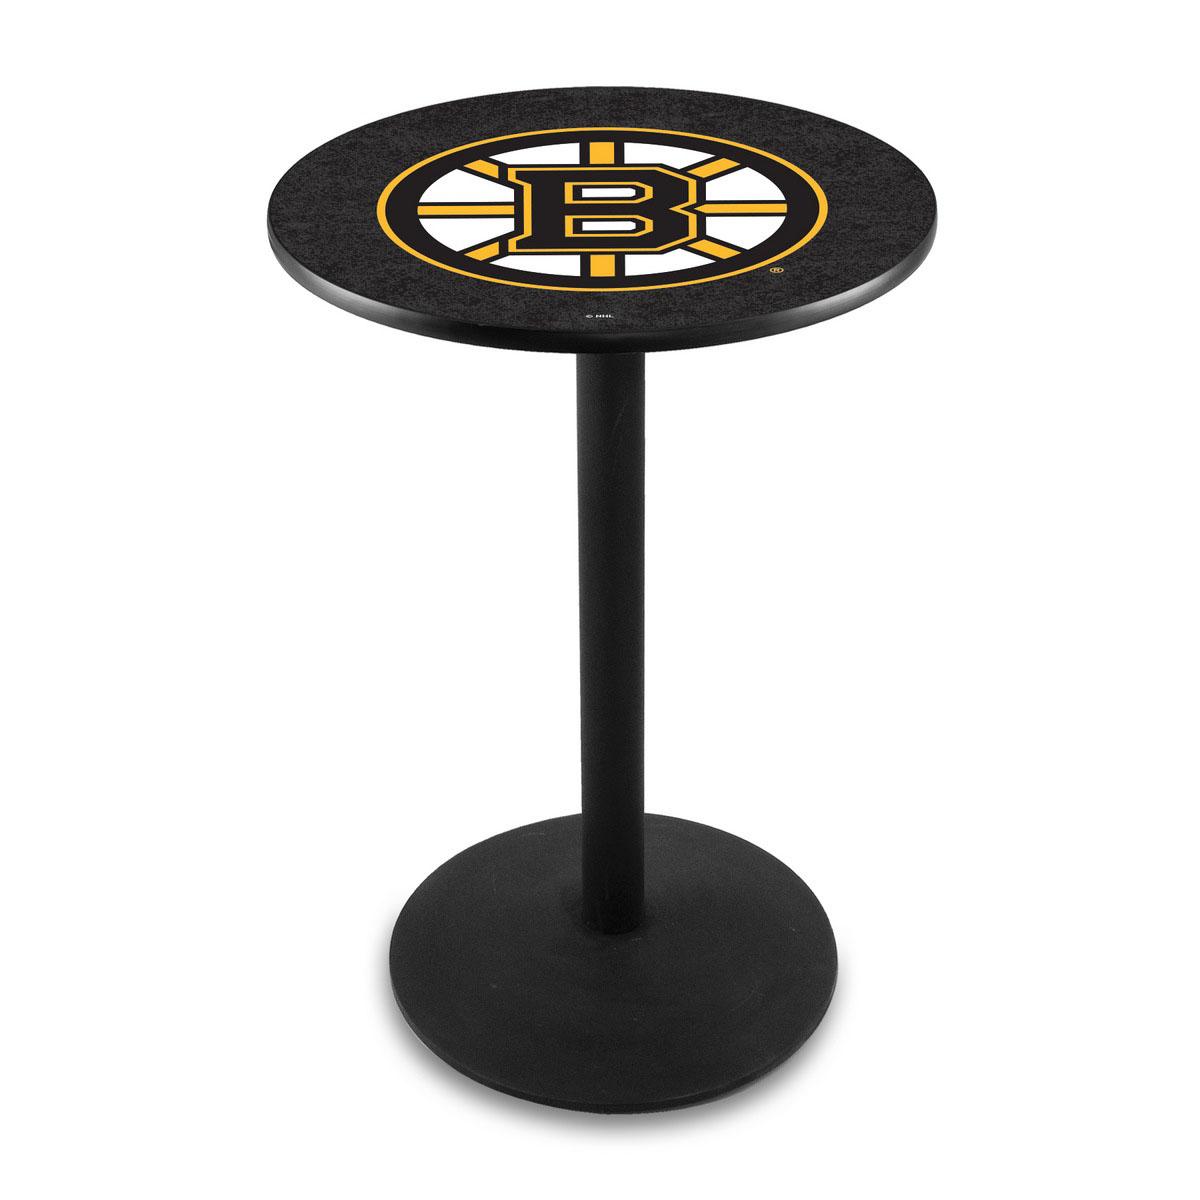 Stunning Boston Bruins Logo Pub Bar Table Round Stand Product Photo